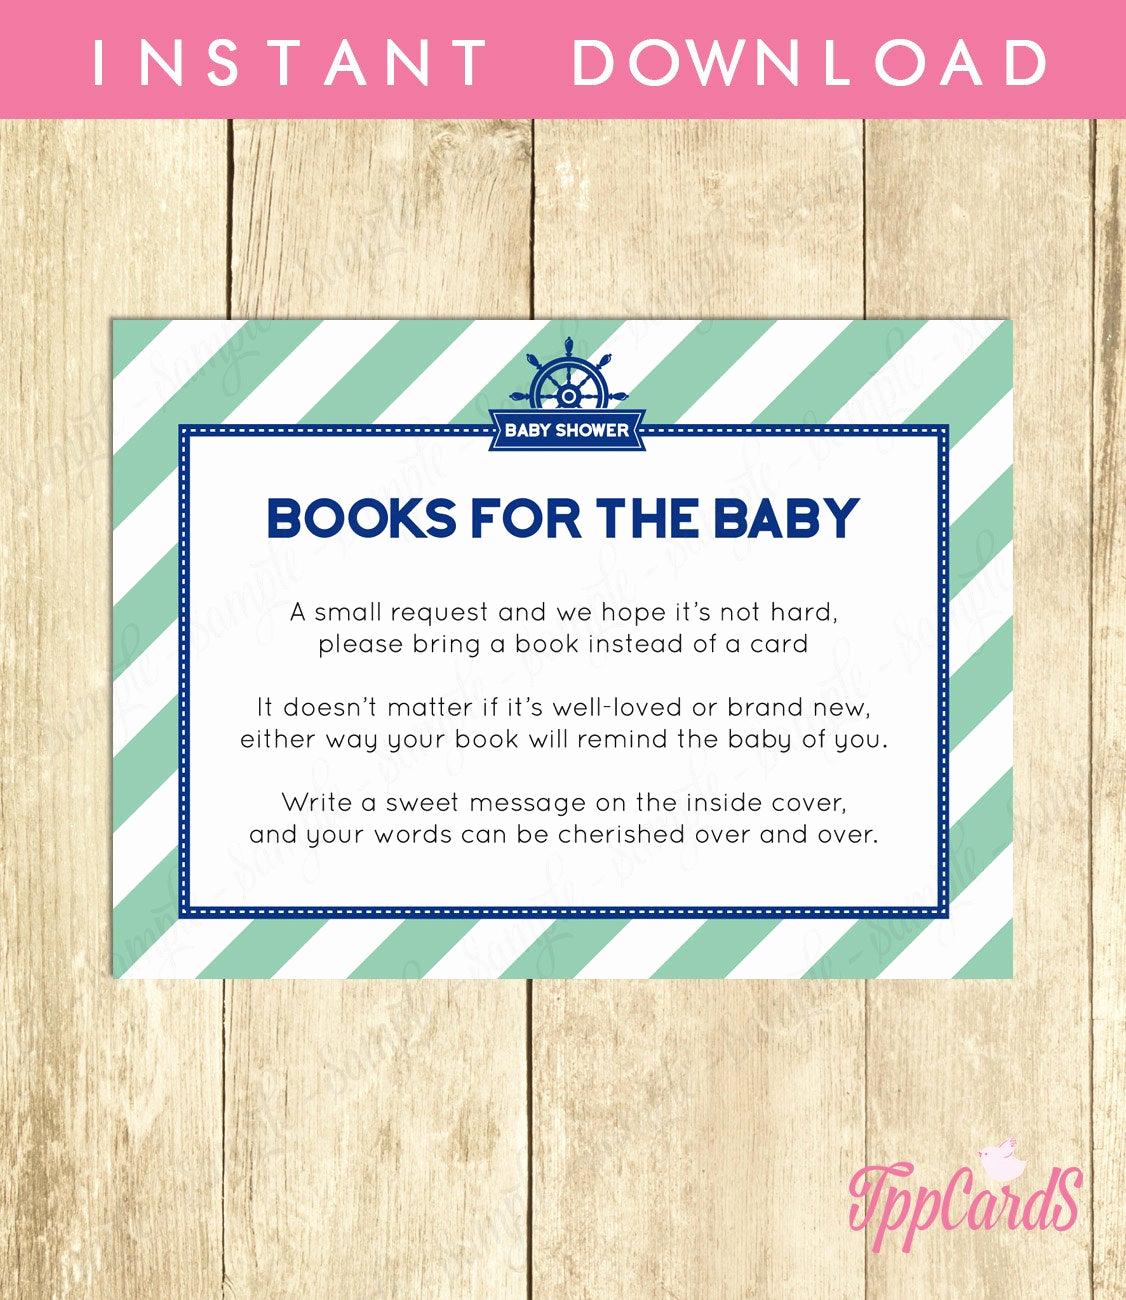 Baby Shower Invitation Inserts Elegant Bring A Book Baby Shower Invitation Insert Instead Of A Card